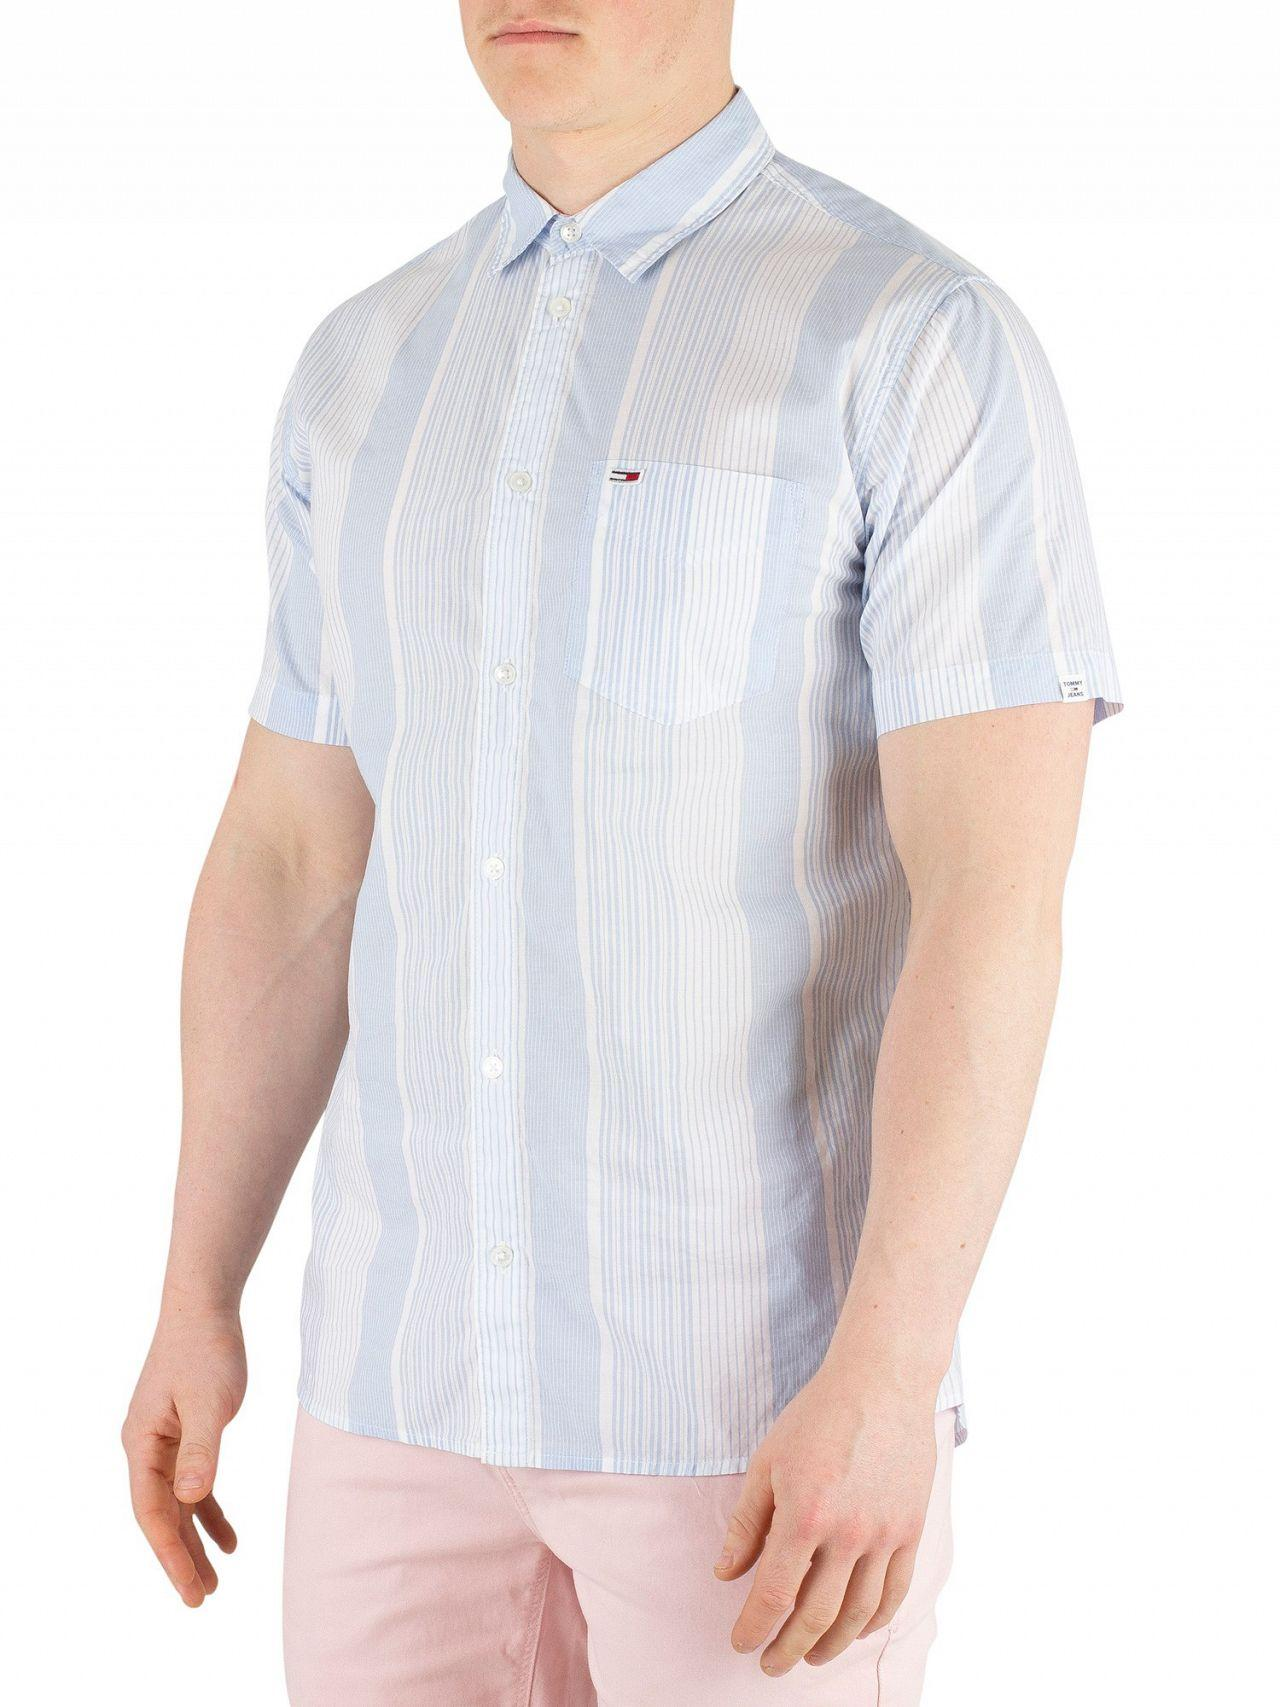 57b0e3f8 Tommy Hilfiger. Men's Light Blue/classic White Striped Poplin Short Sleeved  Shirt